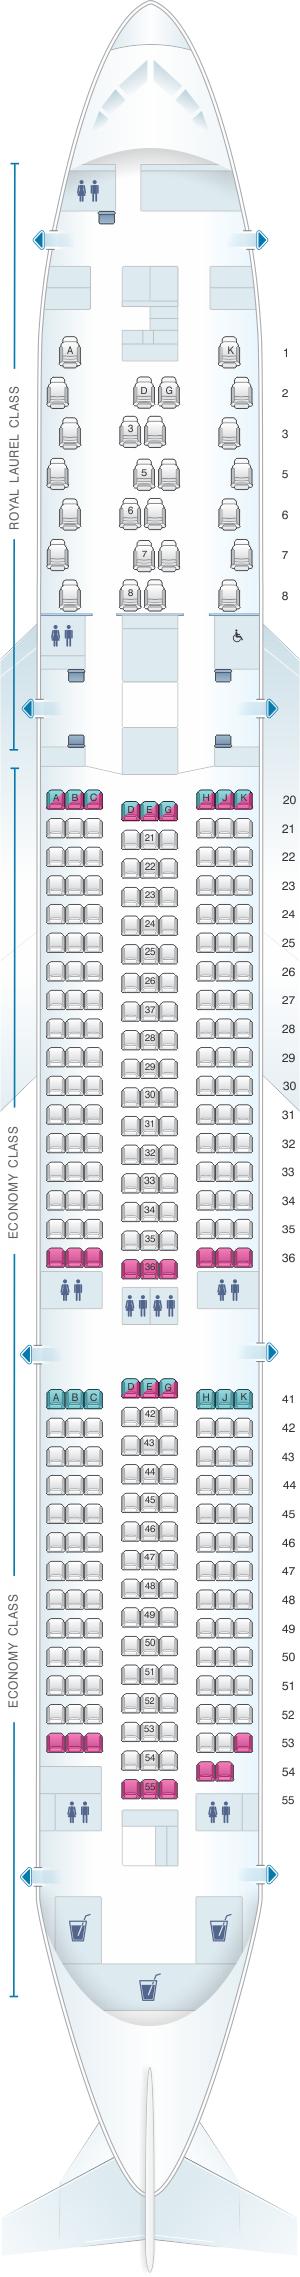 Seat map for Eva Air Boeing B787-9